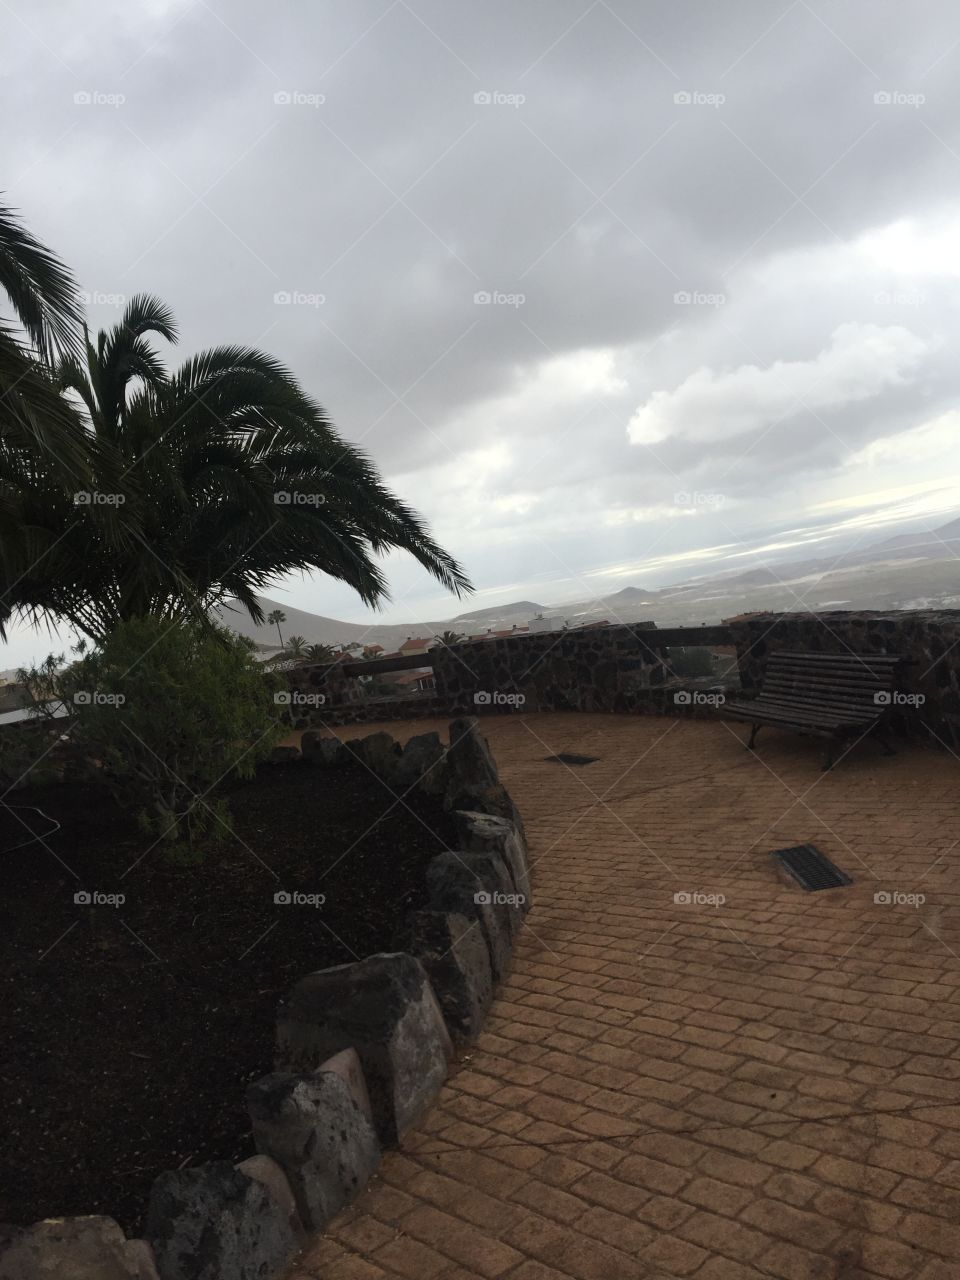 Arona, Tenerife